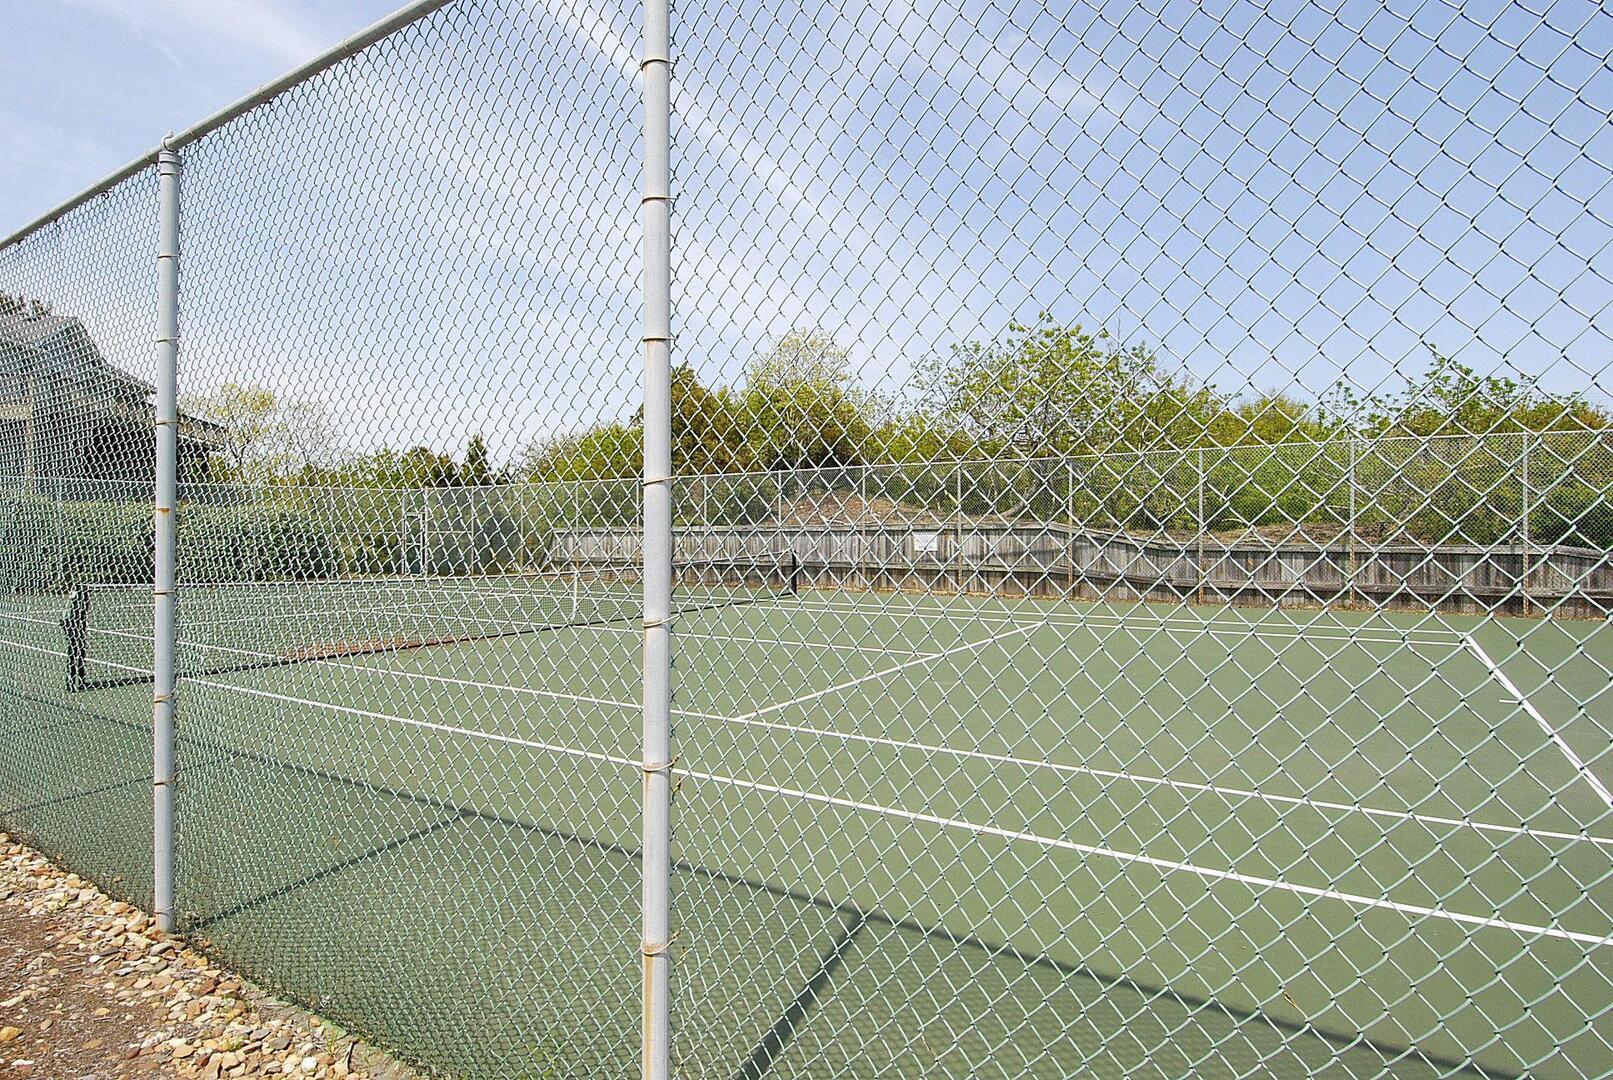 Amenity,Tuckahoe Community Tennis Court,